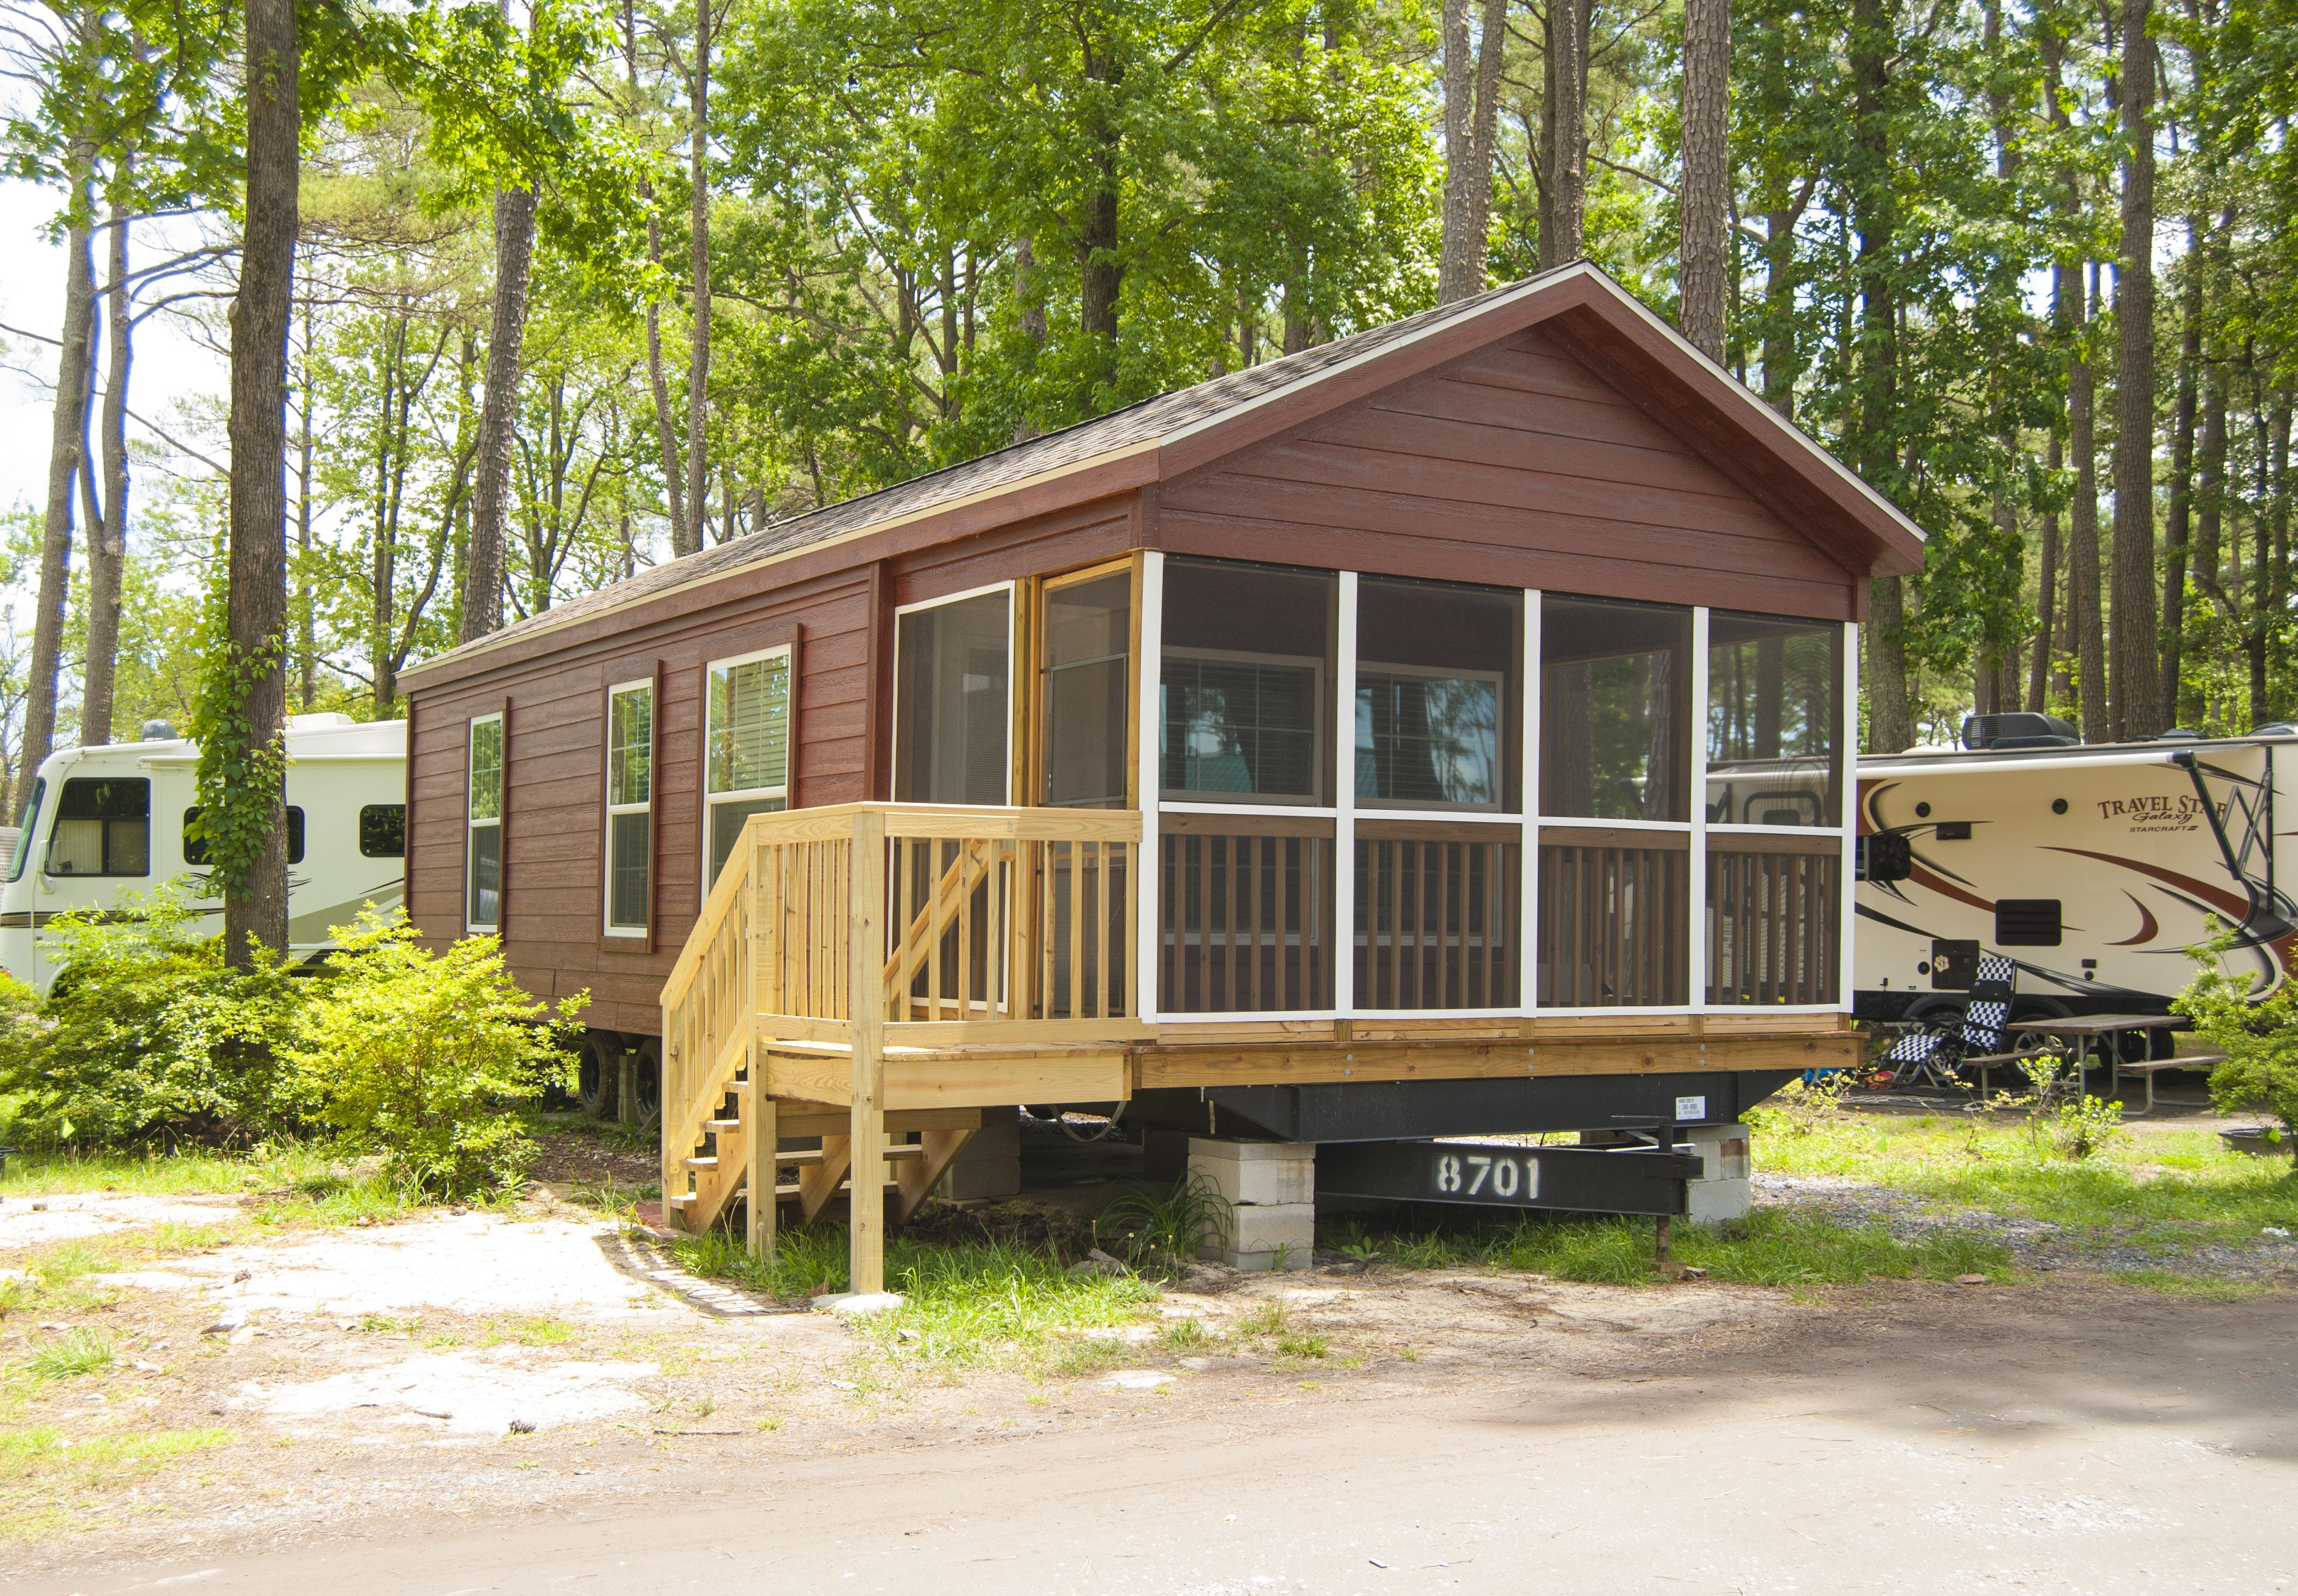 Deluxe park model cabin deluxe park model cabins for Cooper s cabin park city